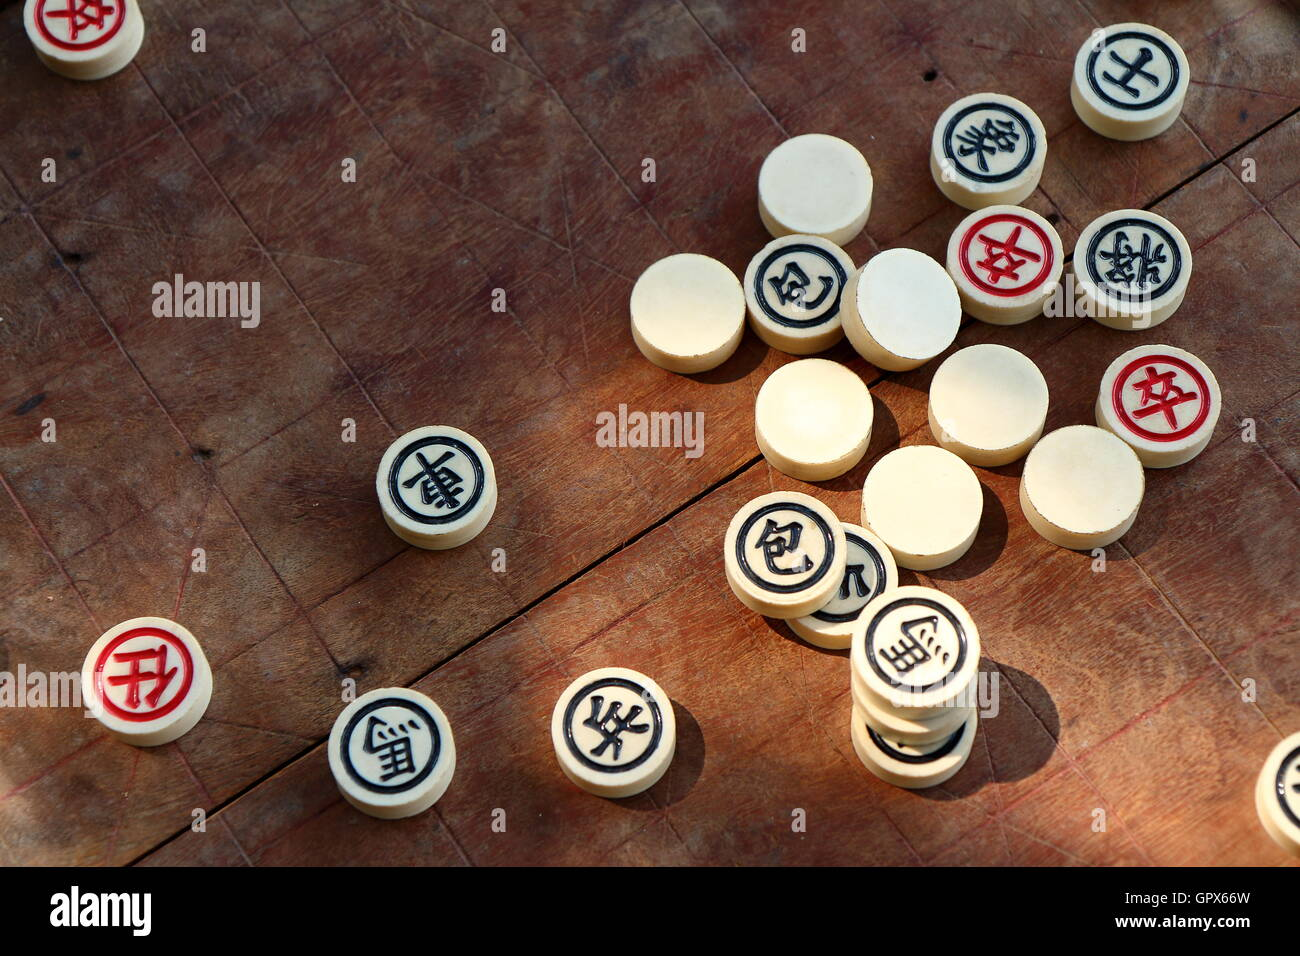 Chinese chess game - Stock Image